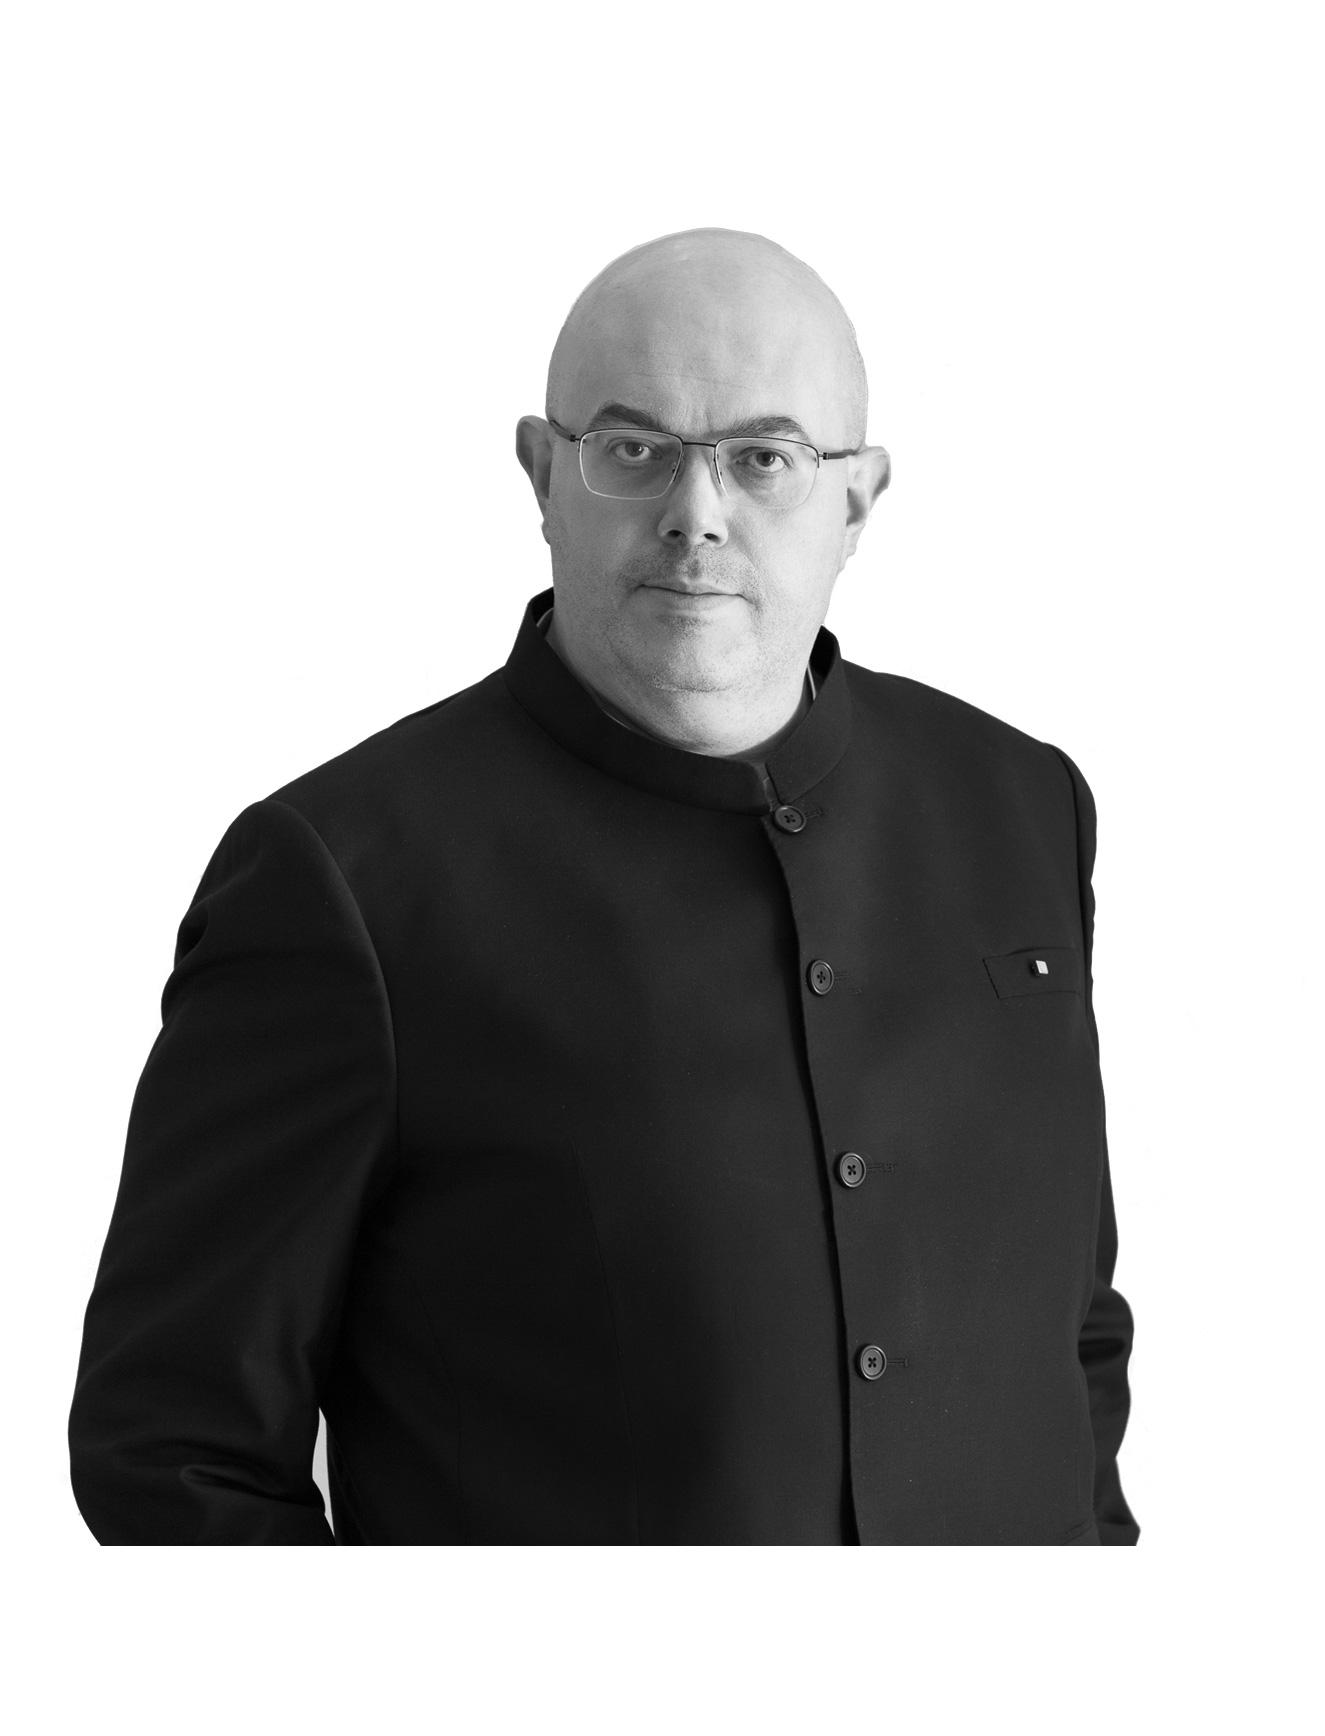 Roberto Gilardino